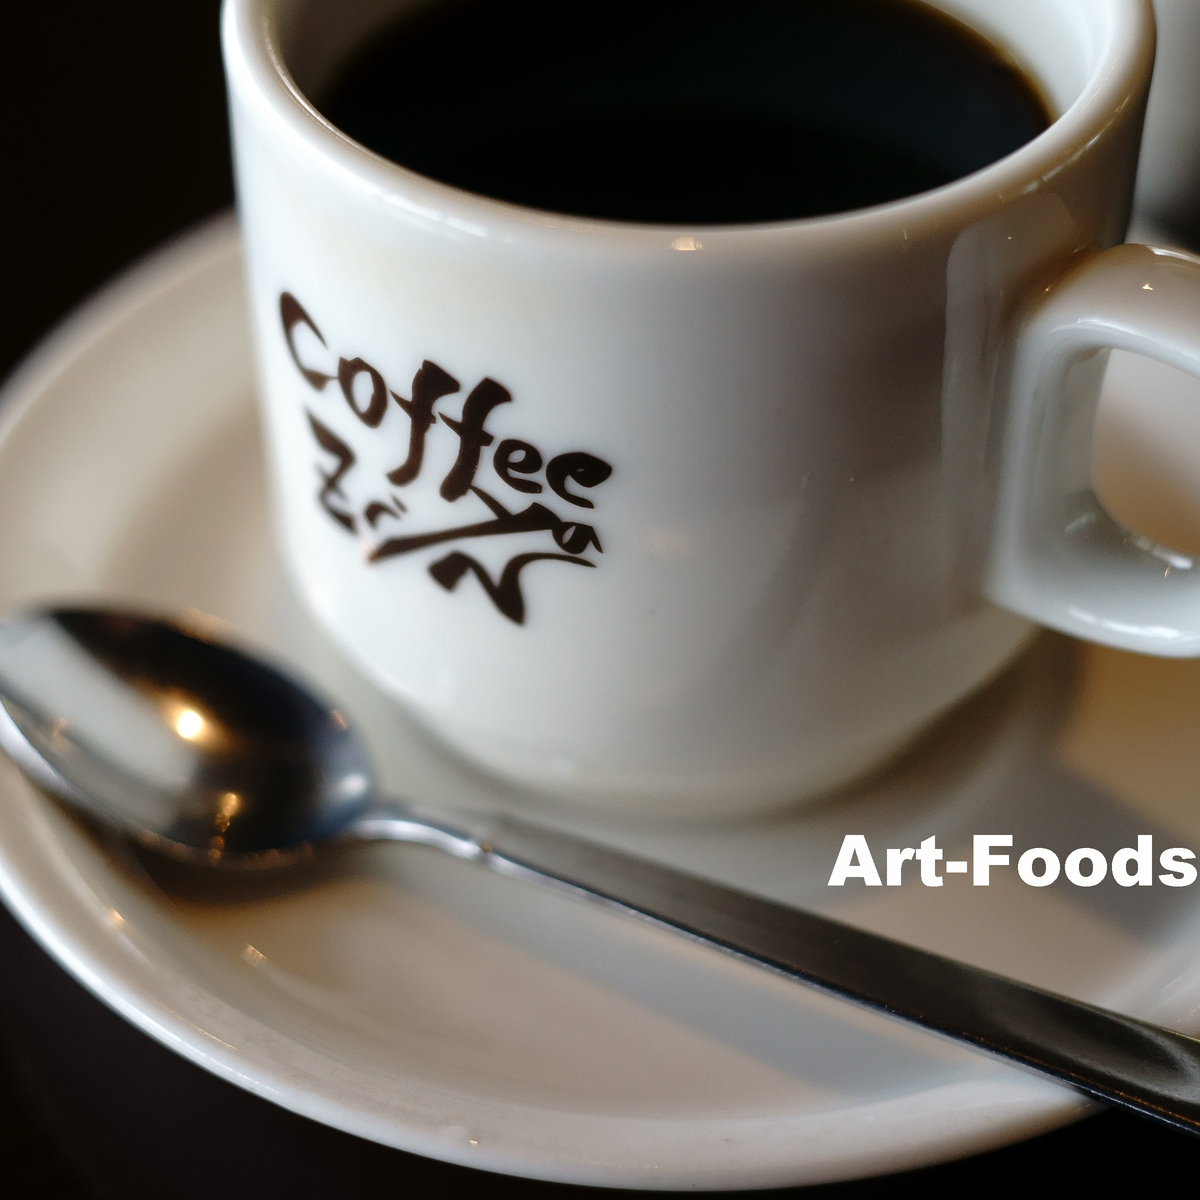 f:id:artfoods:20190517193040j:image:w400:left